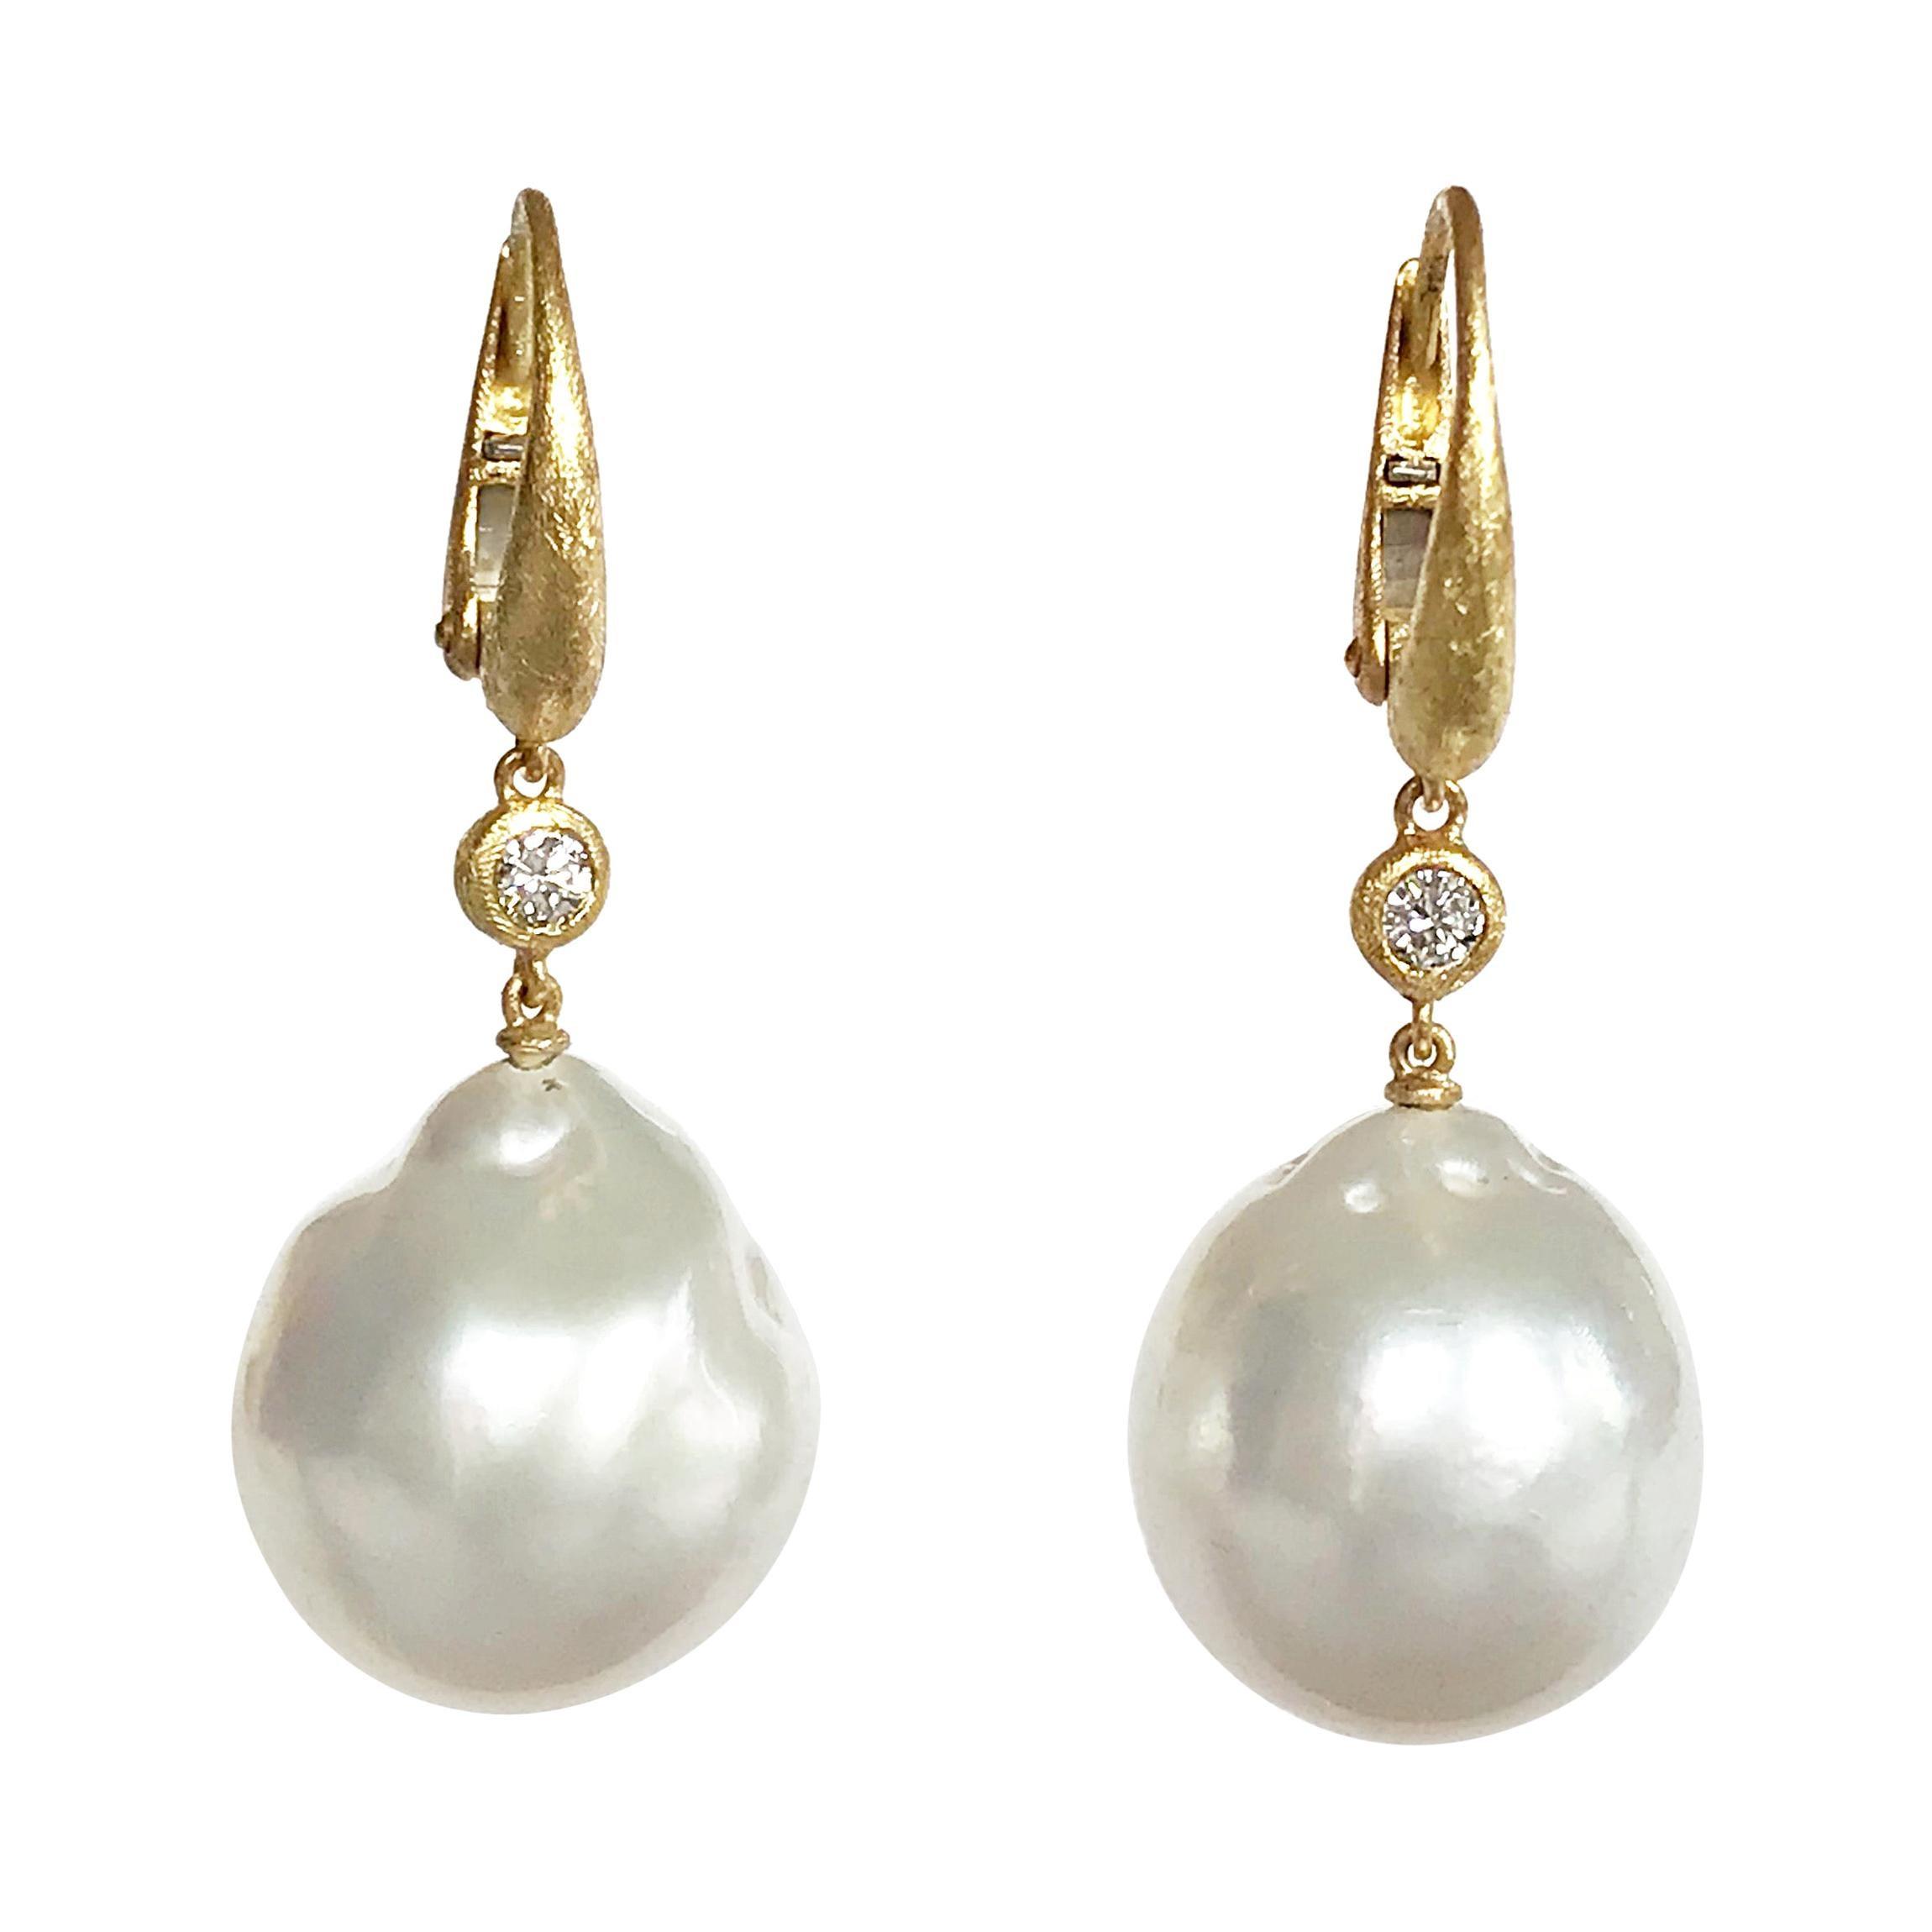 Dalben Design South Sea Baroque Pearl and Diamond Yellow Gold Dangle Earrings